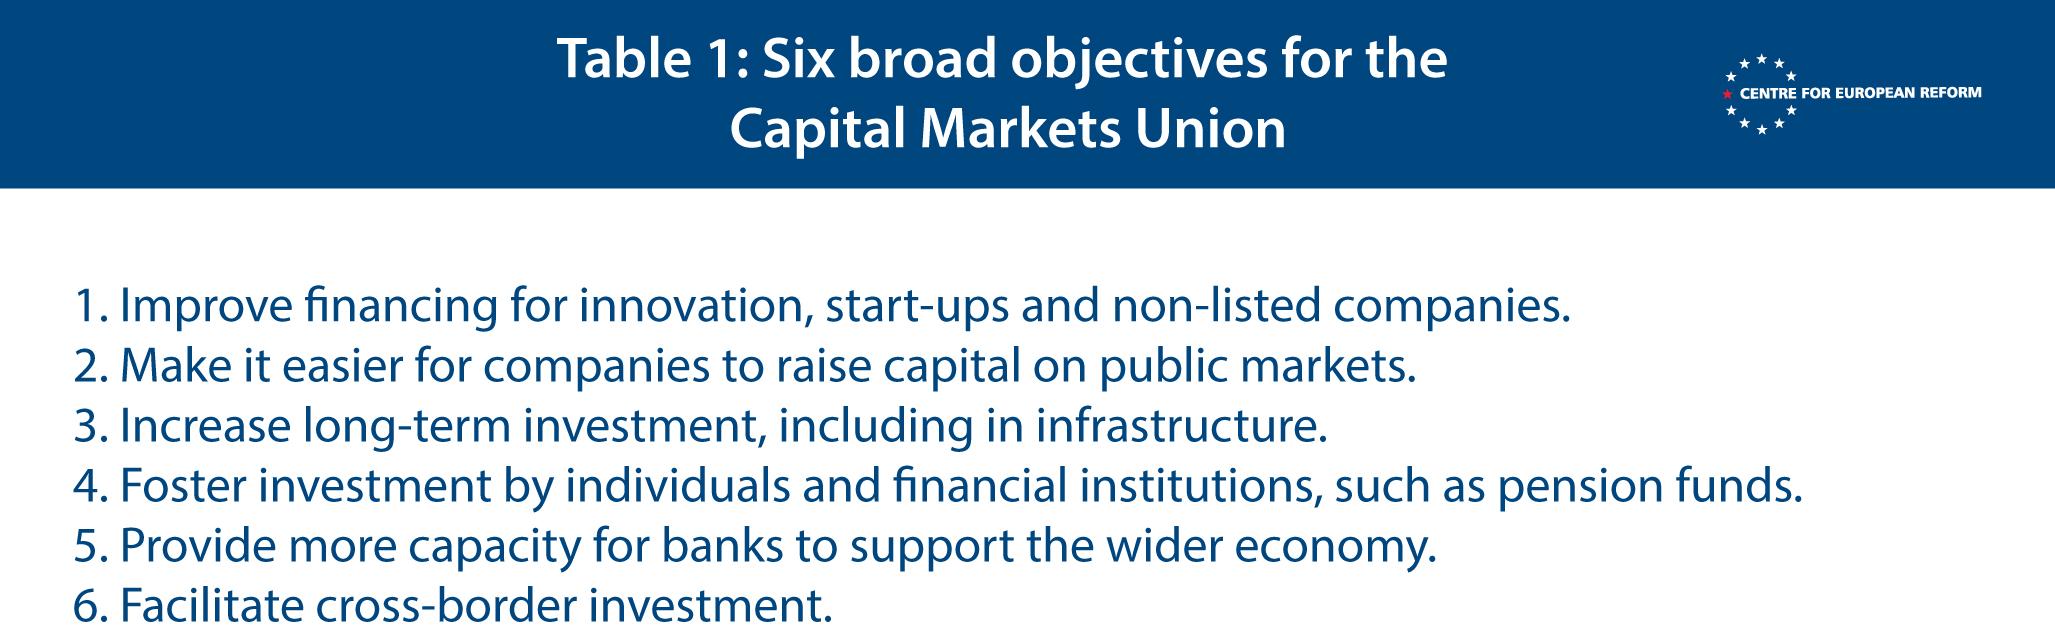 The capital markets union: Should the EU shut out the City